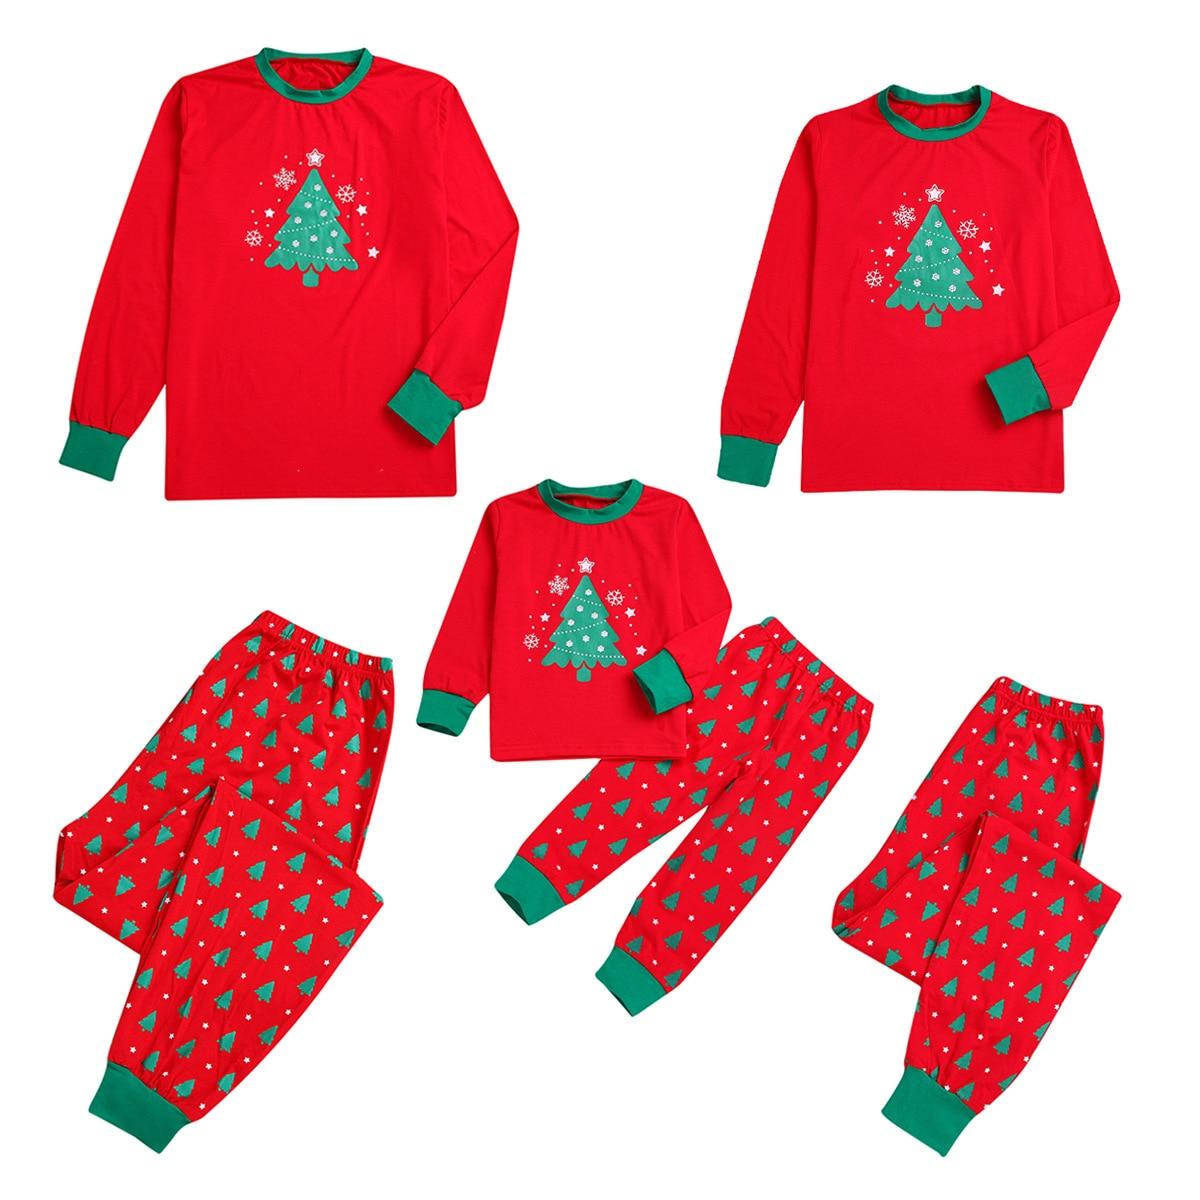 2020 família natal combinando pijamas define mãe filha pai filho e me sleepwear nightwear olhar família árvore roupas ternos